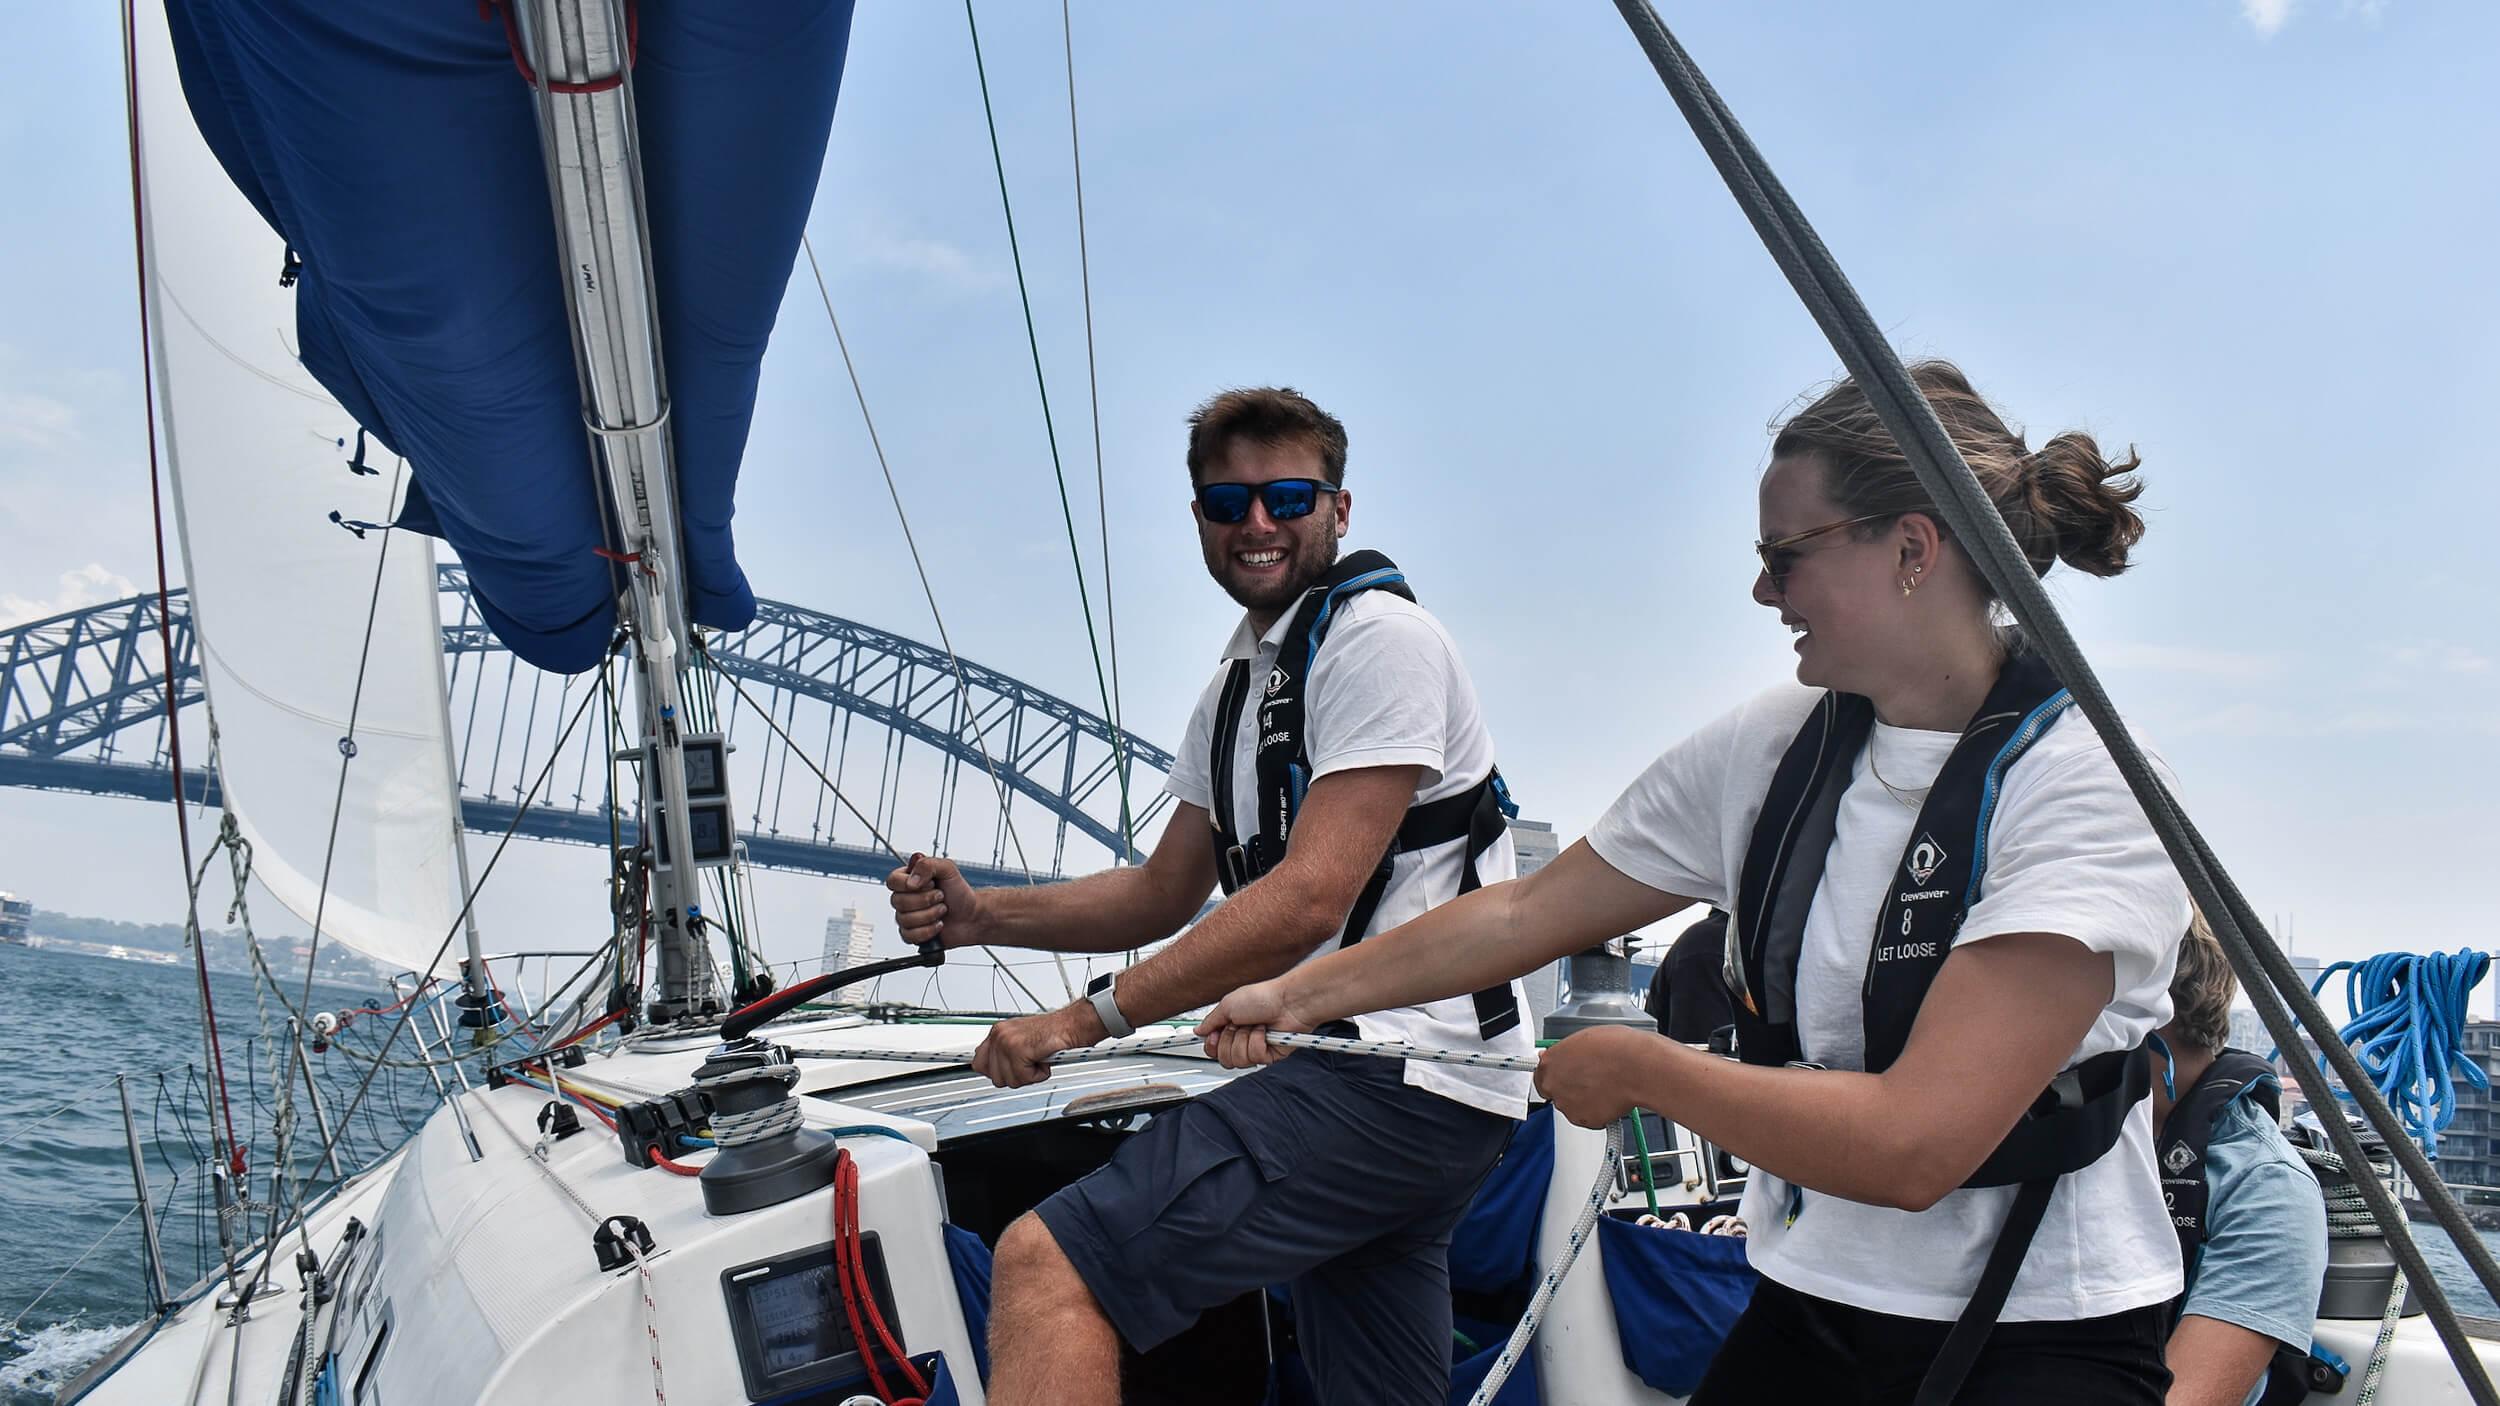 Flying-Fish-Sailing-Start-yachting-wkend.jpg